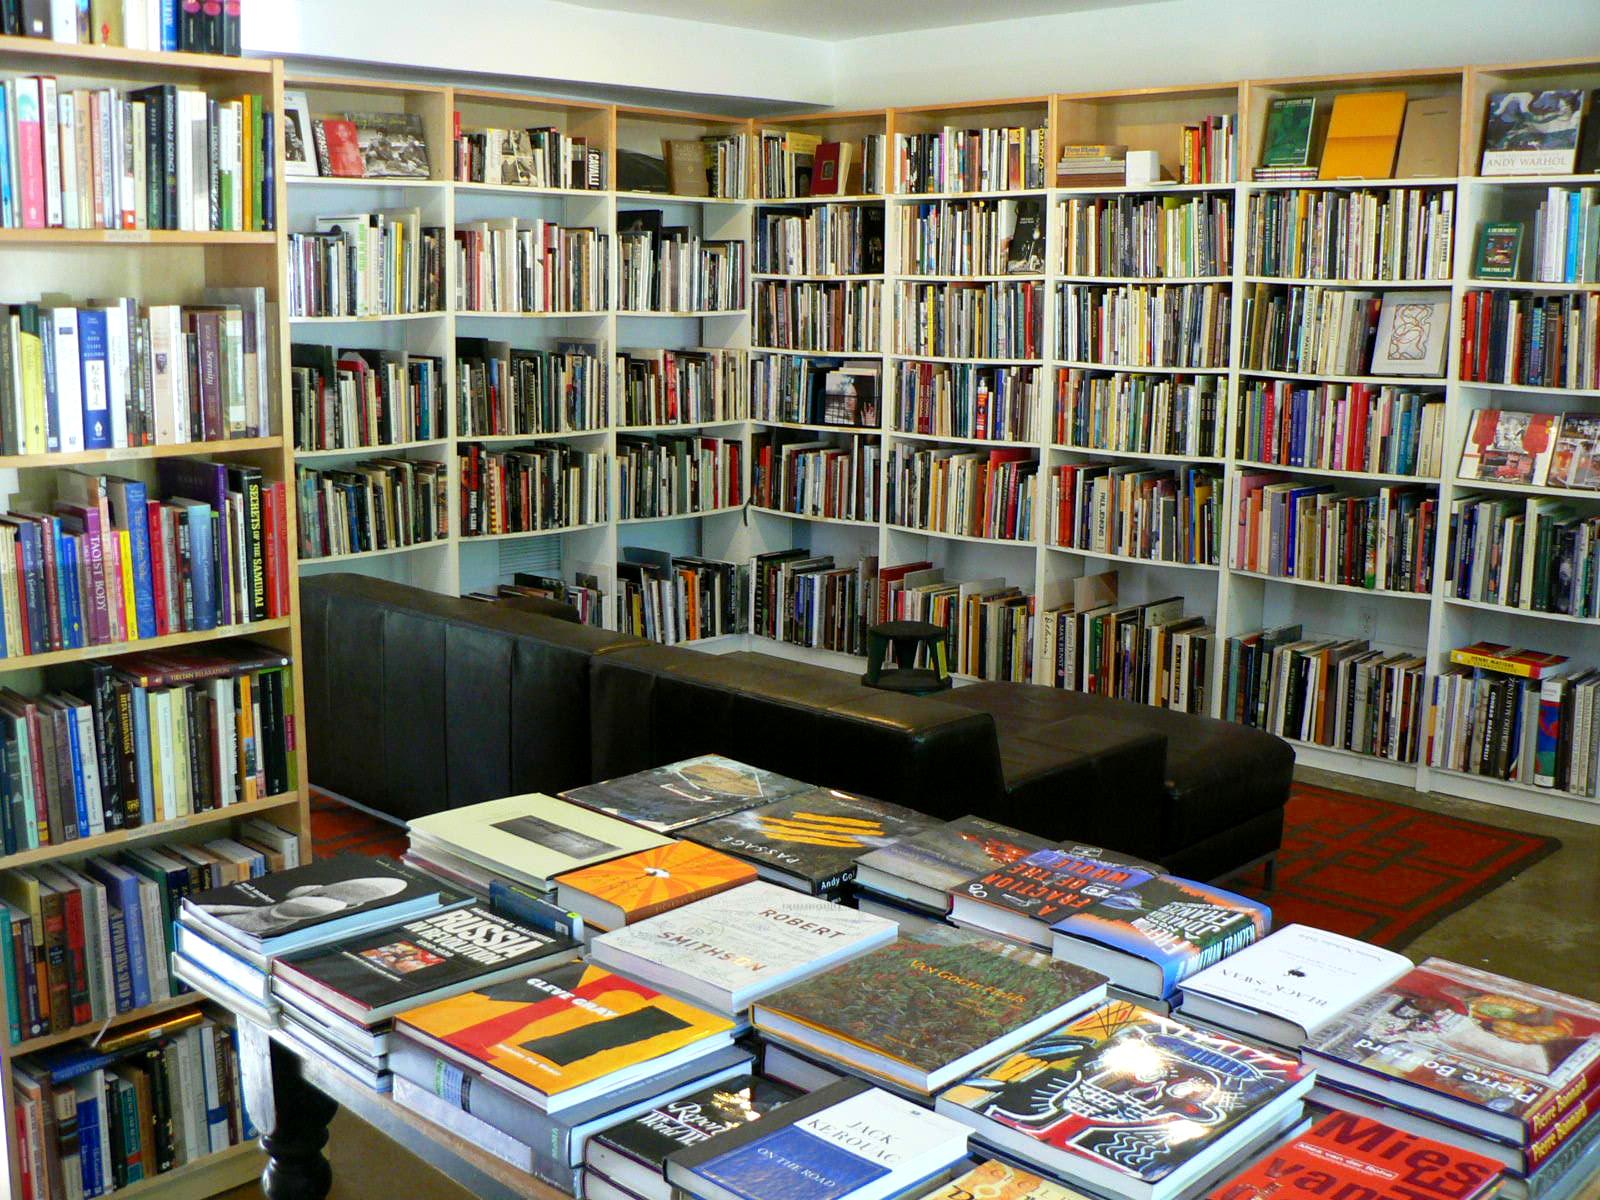 ... 11964 blackcatbooks OZ books Since 1996 Black Cat ...